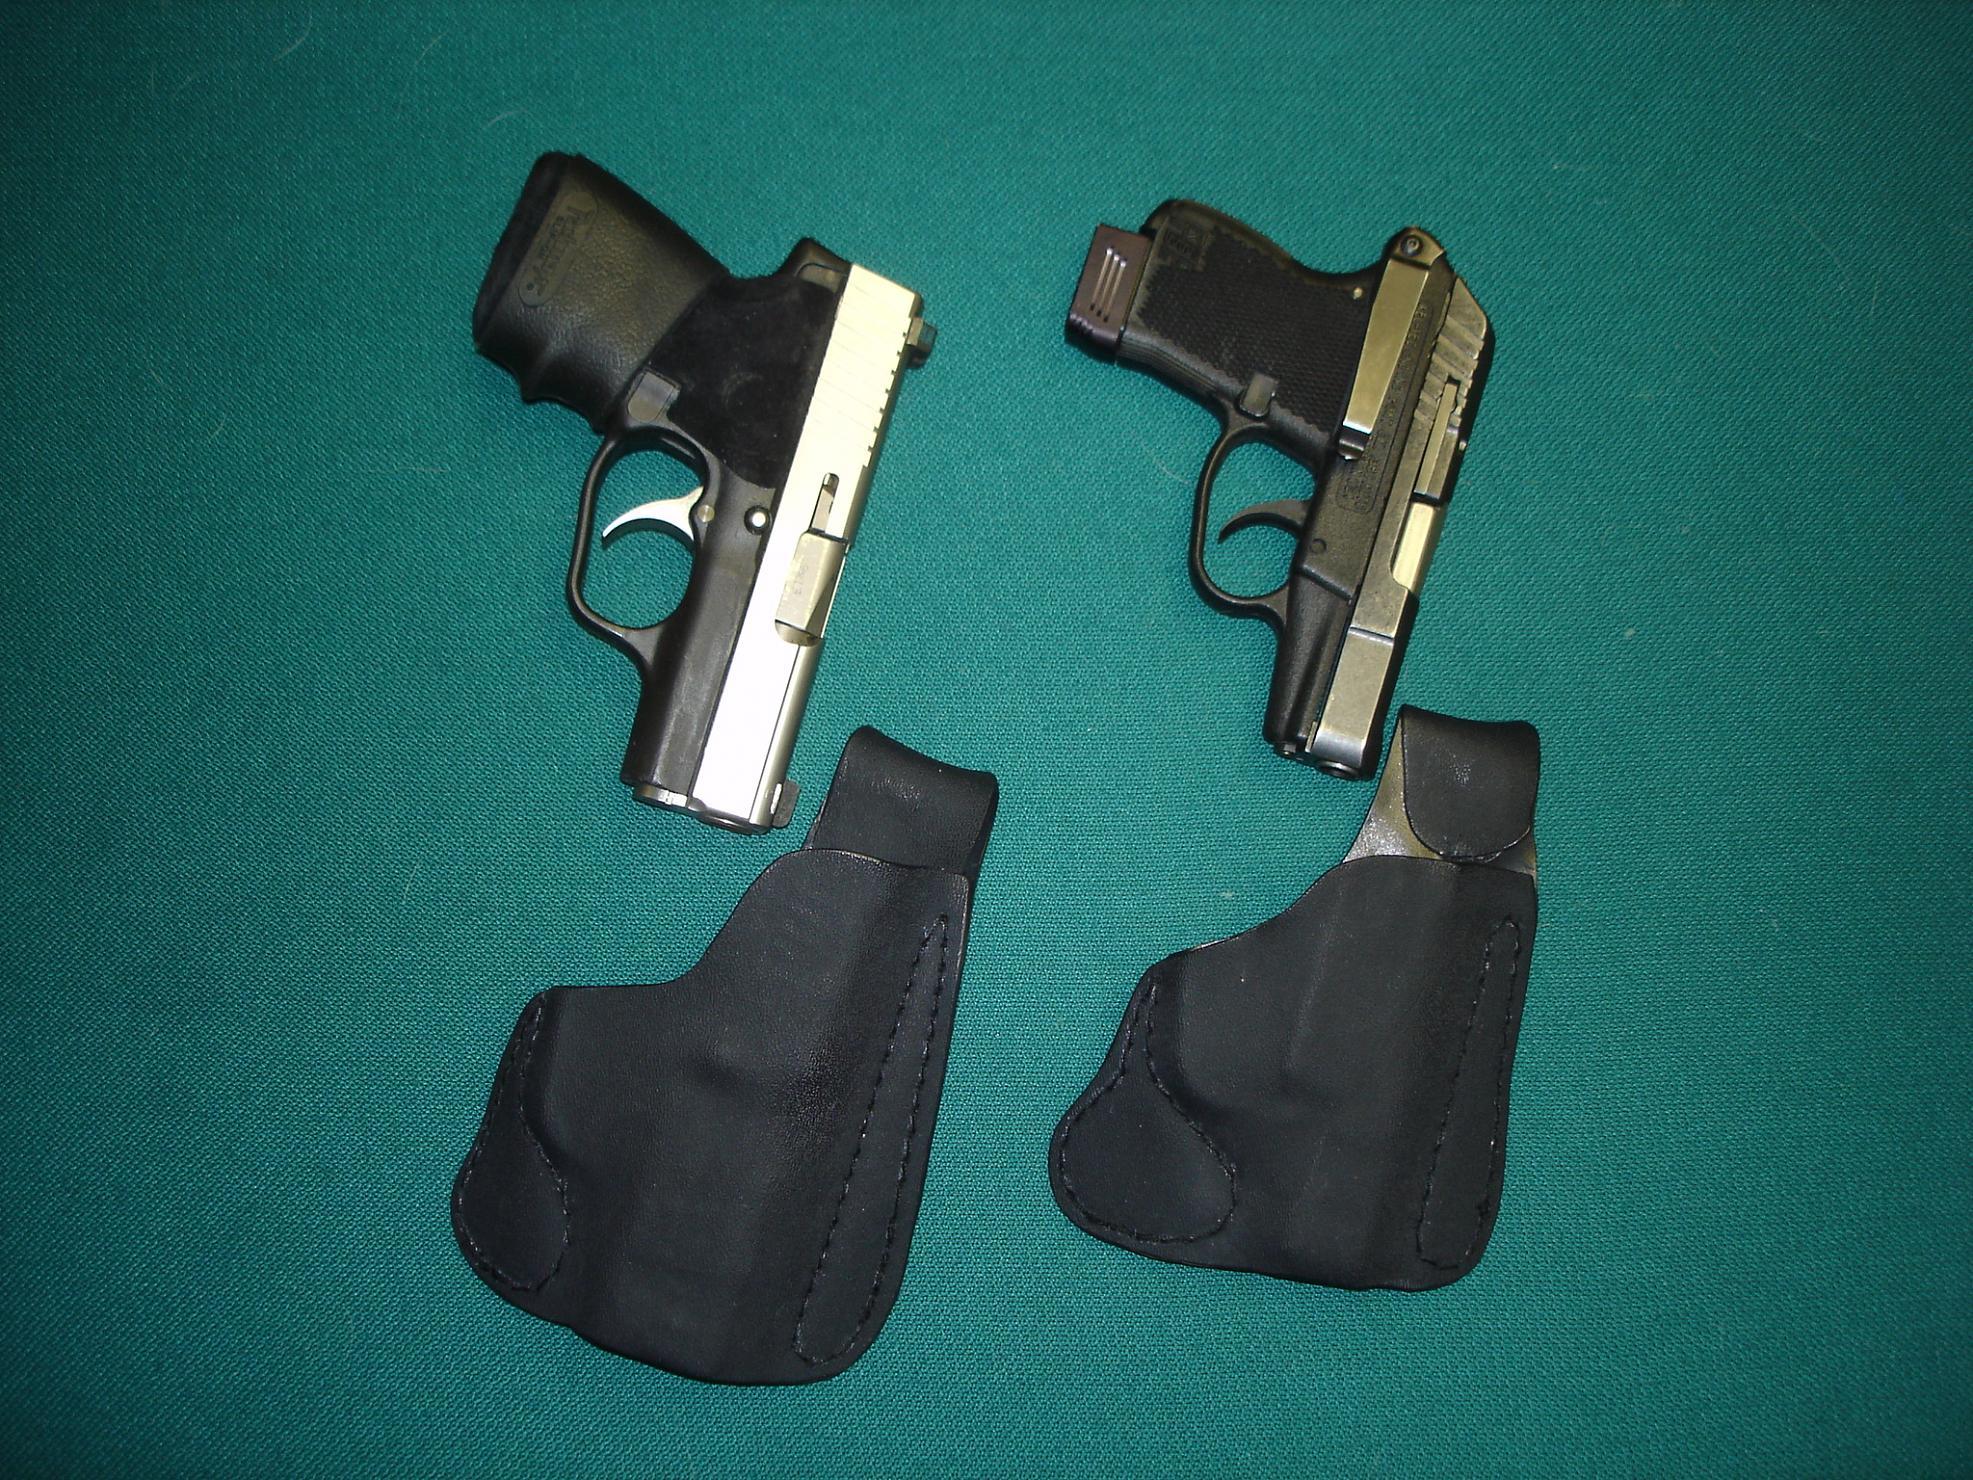 FIST kydex pocket holsters.-dsc00095.jpg